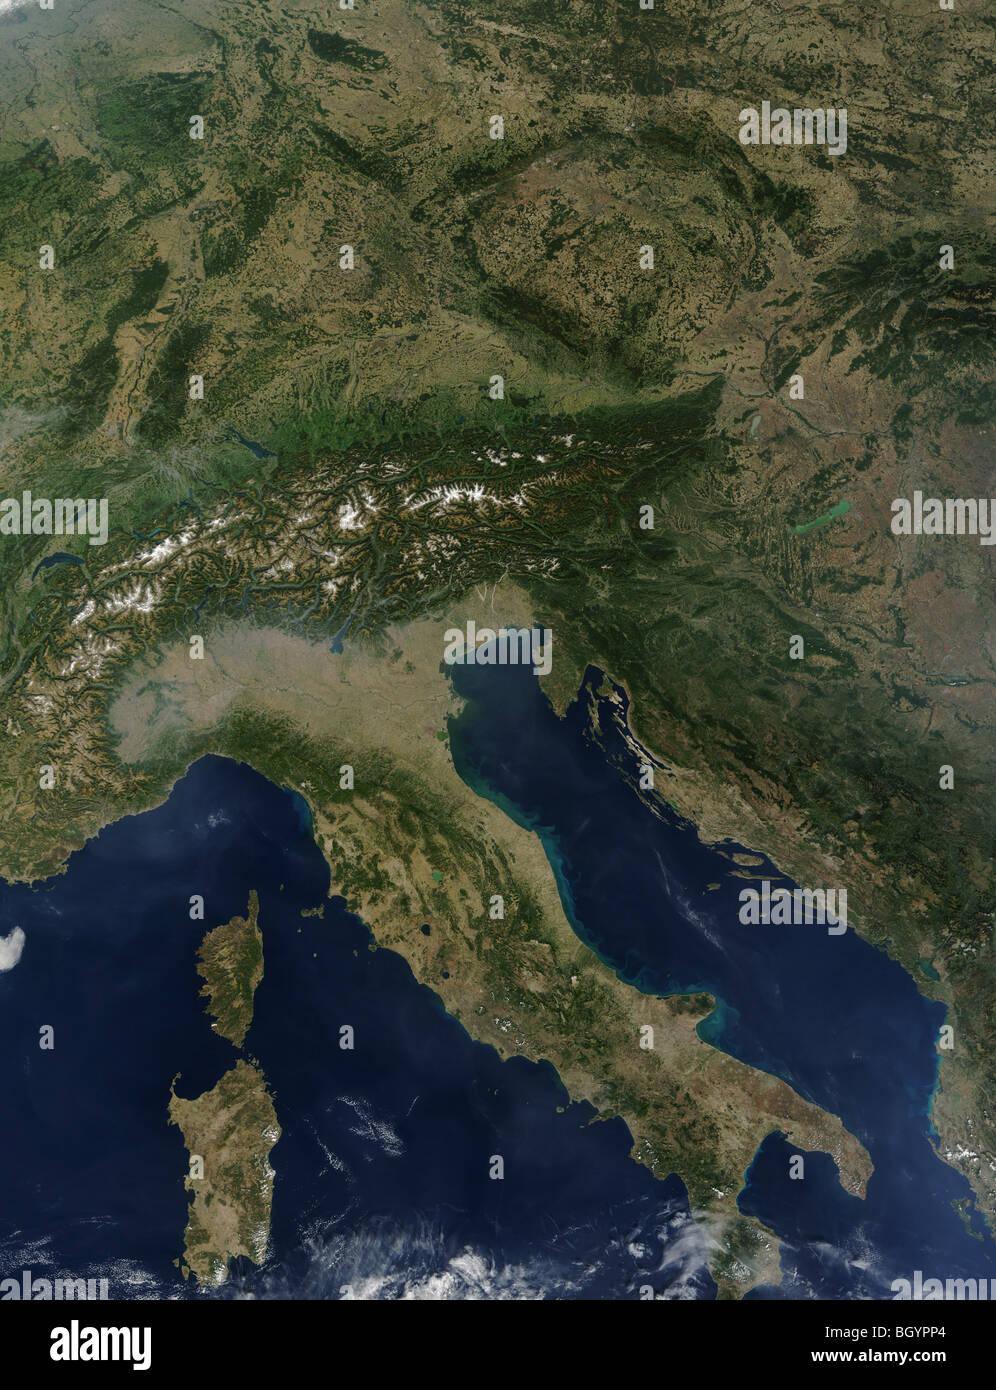 Satellite view of Italy credit NASA